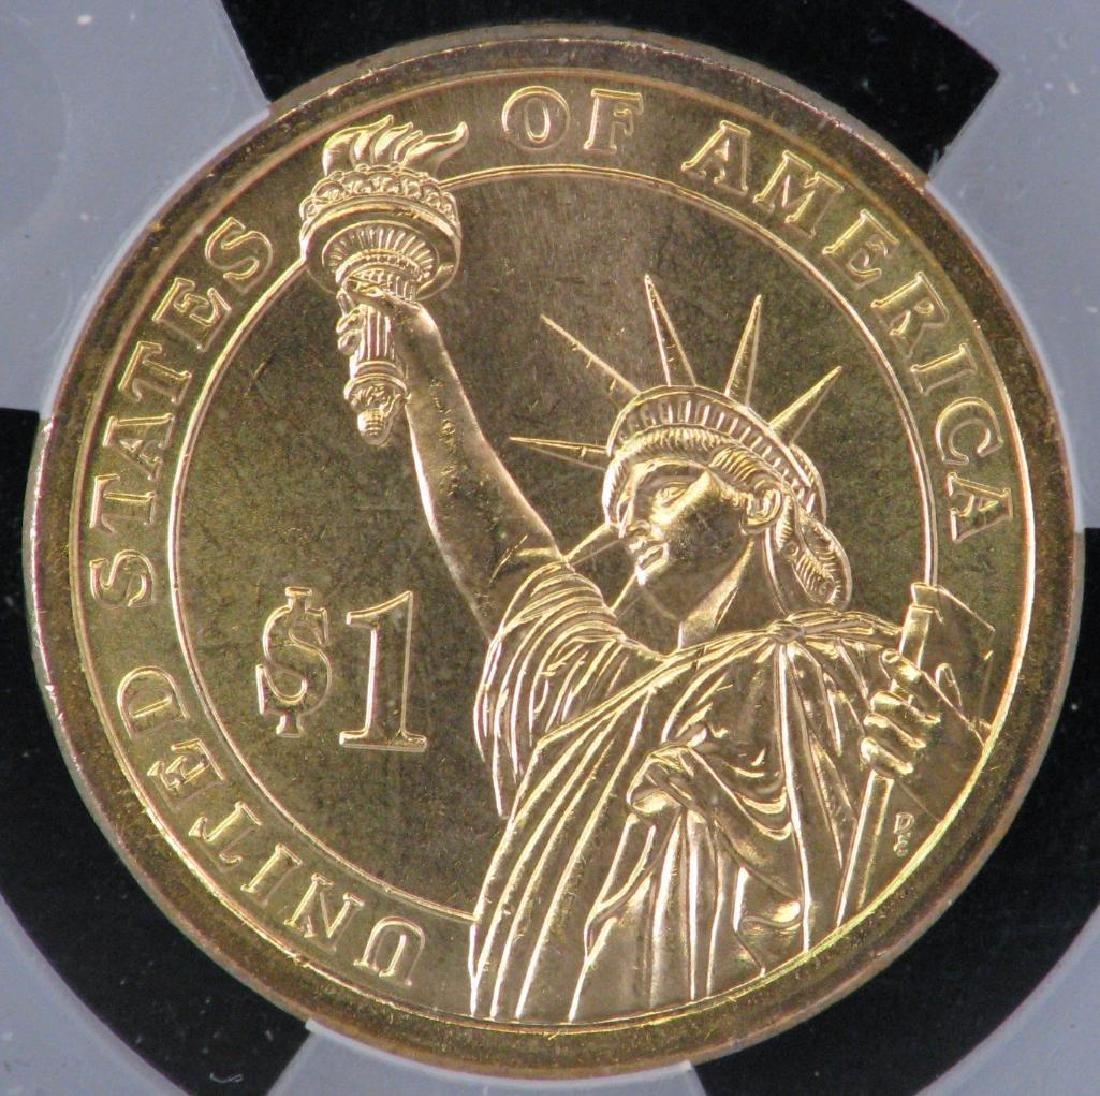 2007-P Presidential Dollar : John Adams - Mint Error - 4